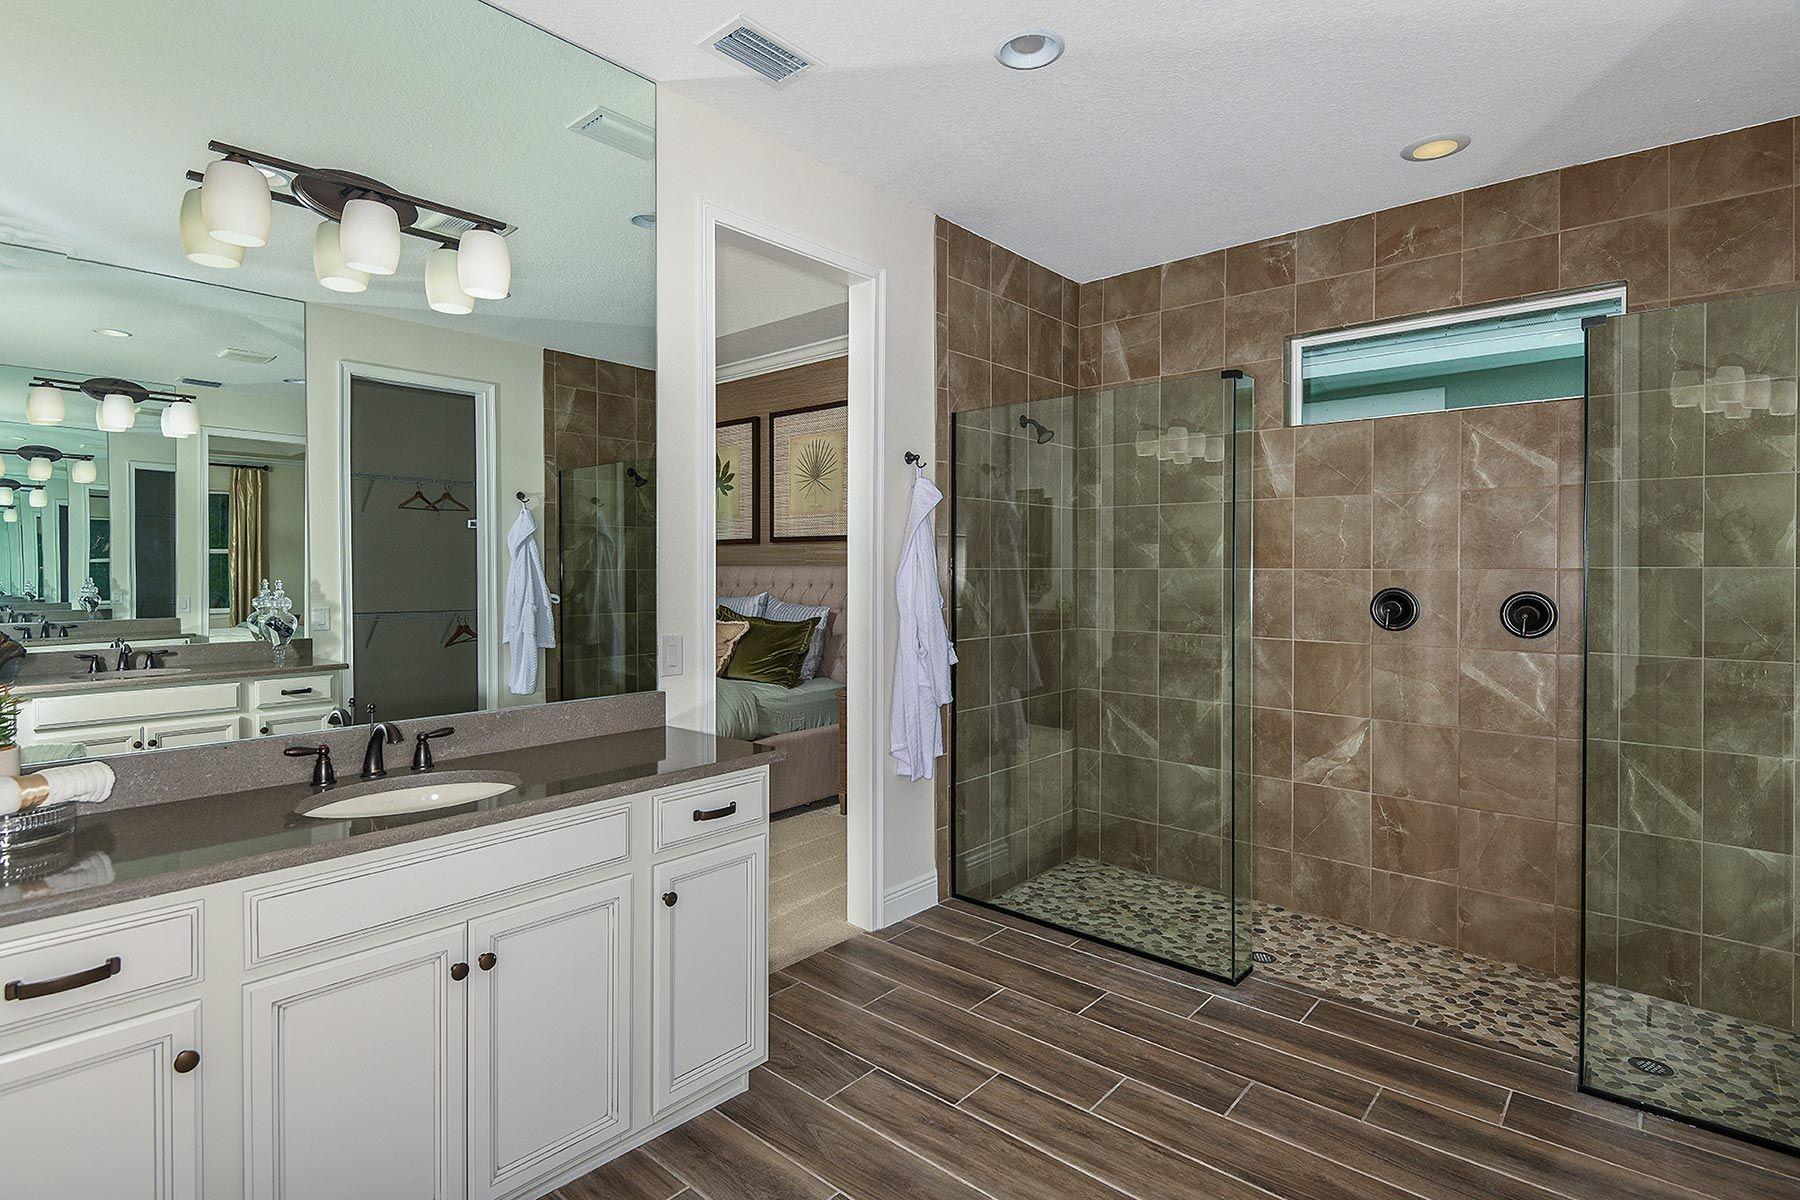 Bathroom featured in the Sunlit By Mattamy Homes in Sarasota-Bradenton, FL